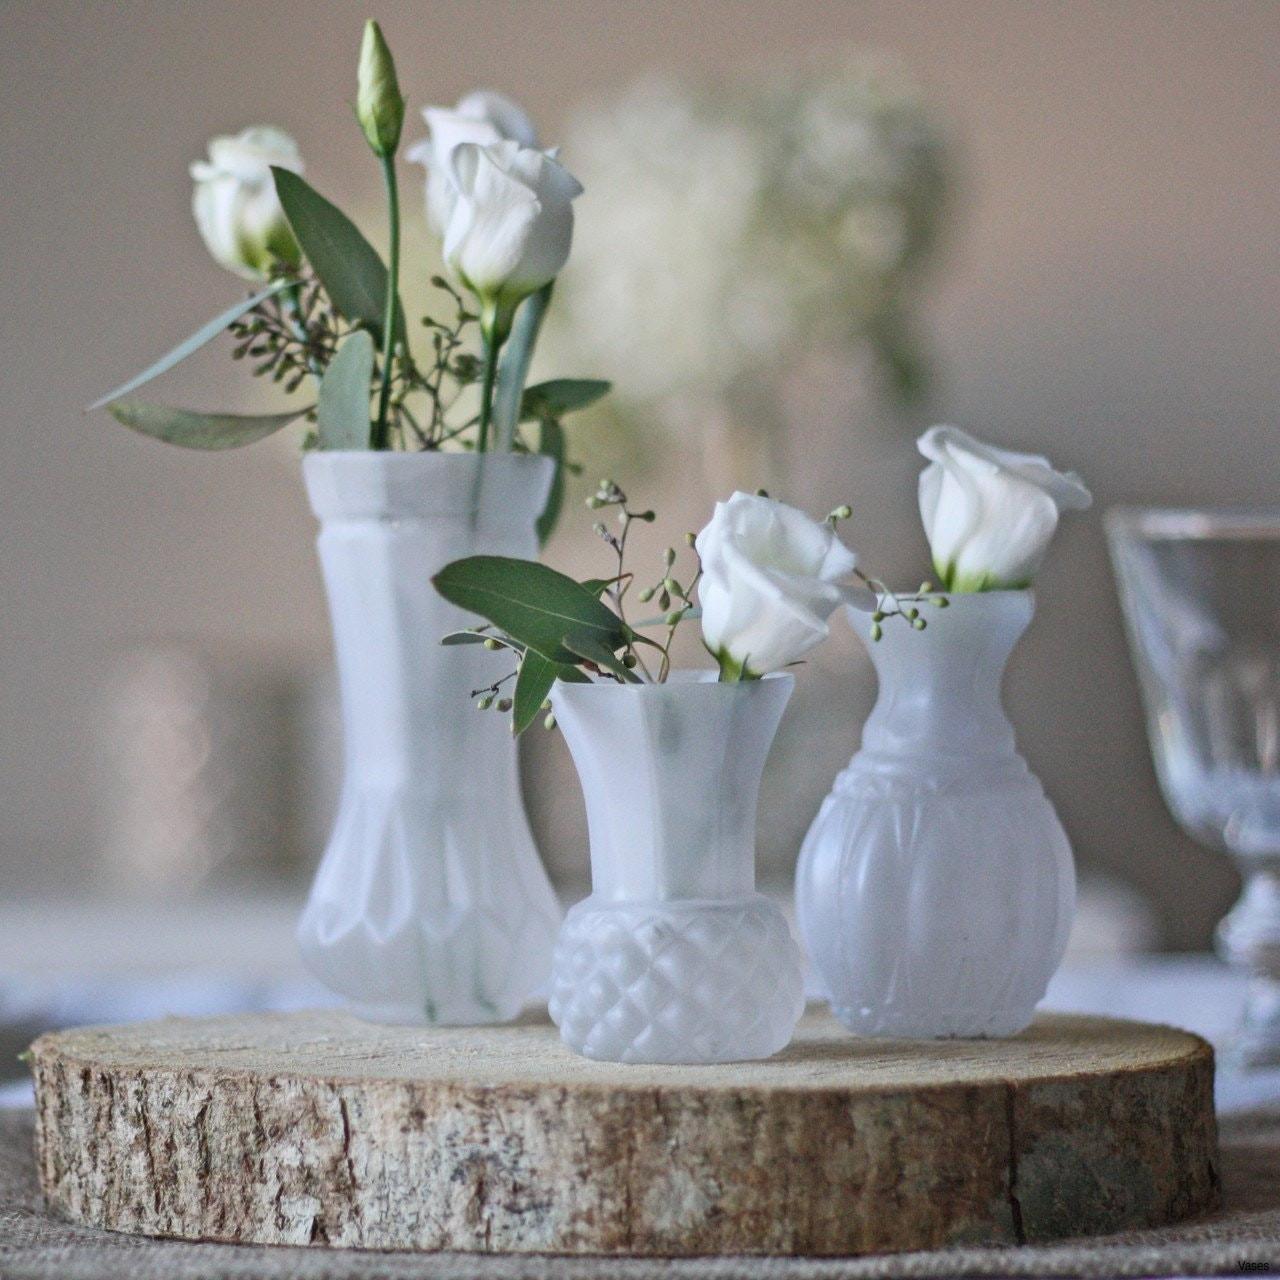 growing bulbs in vases of awesome jar flower 1h vases bud wedding vase centerpiece idea i 0d throughout awesome jar flower 1h vases bud wedding vase centerpiece idea i 0d white of awesome jar